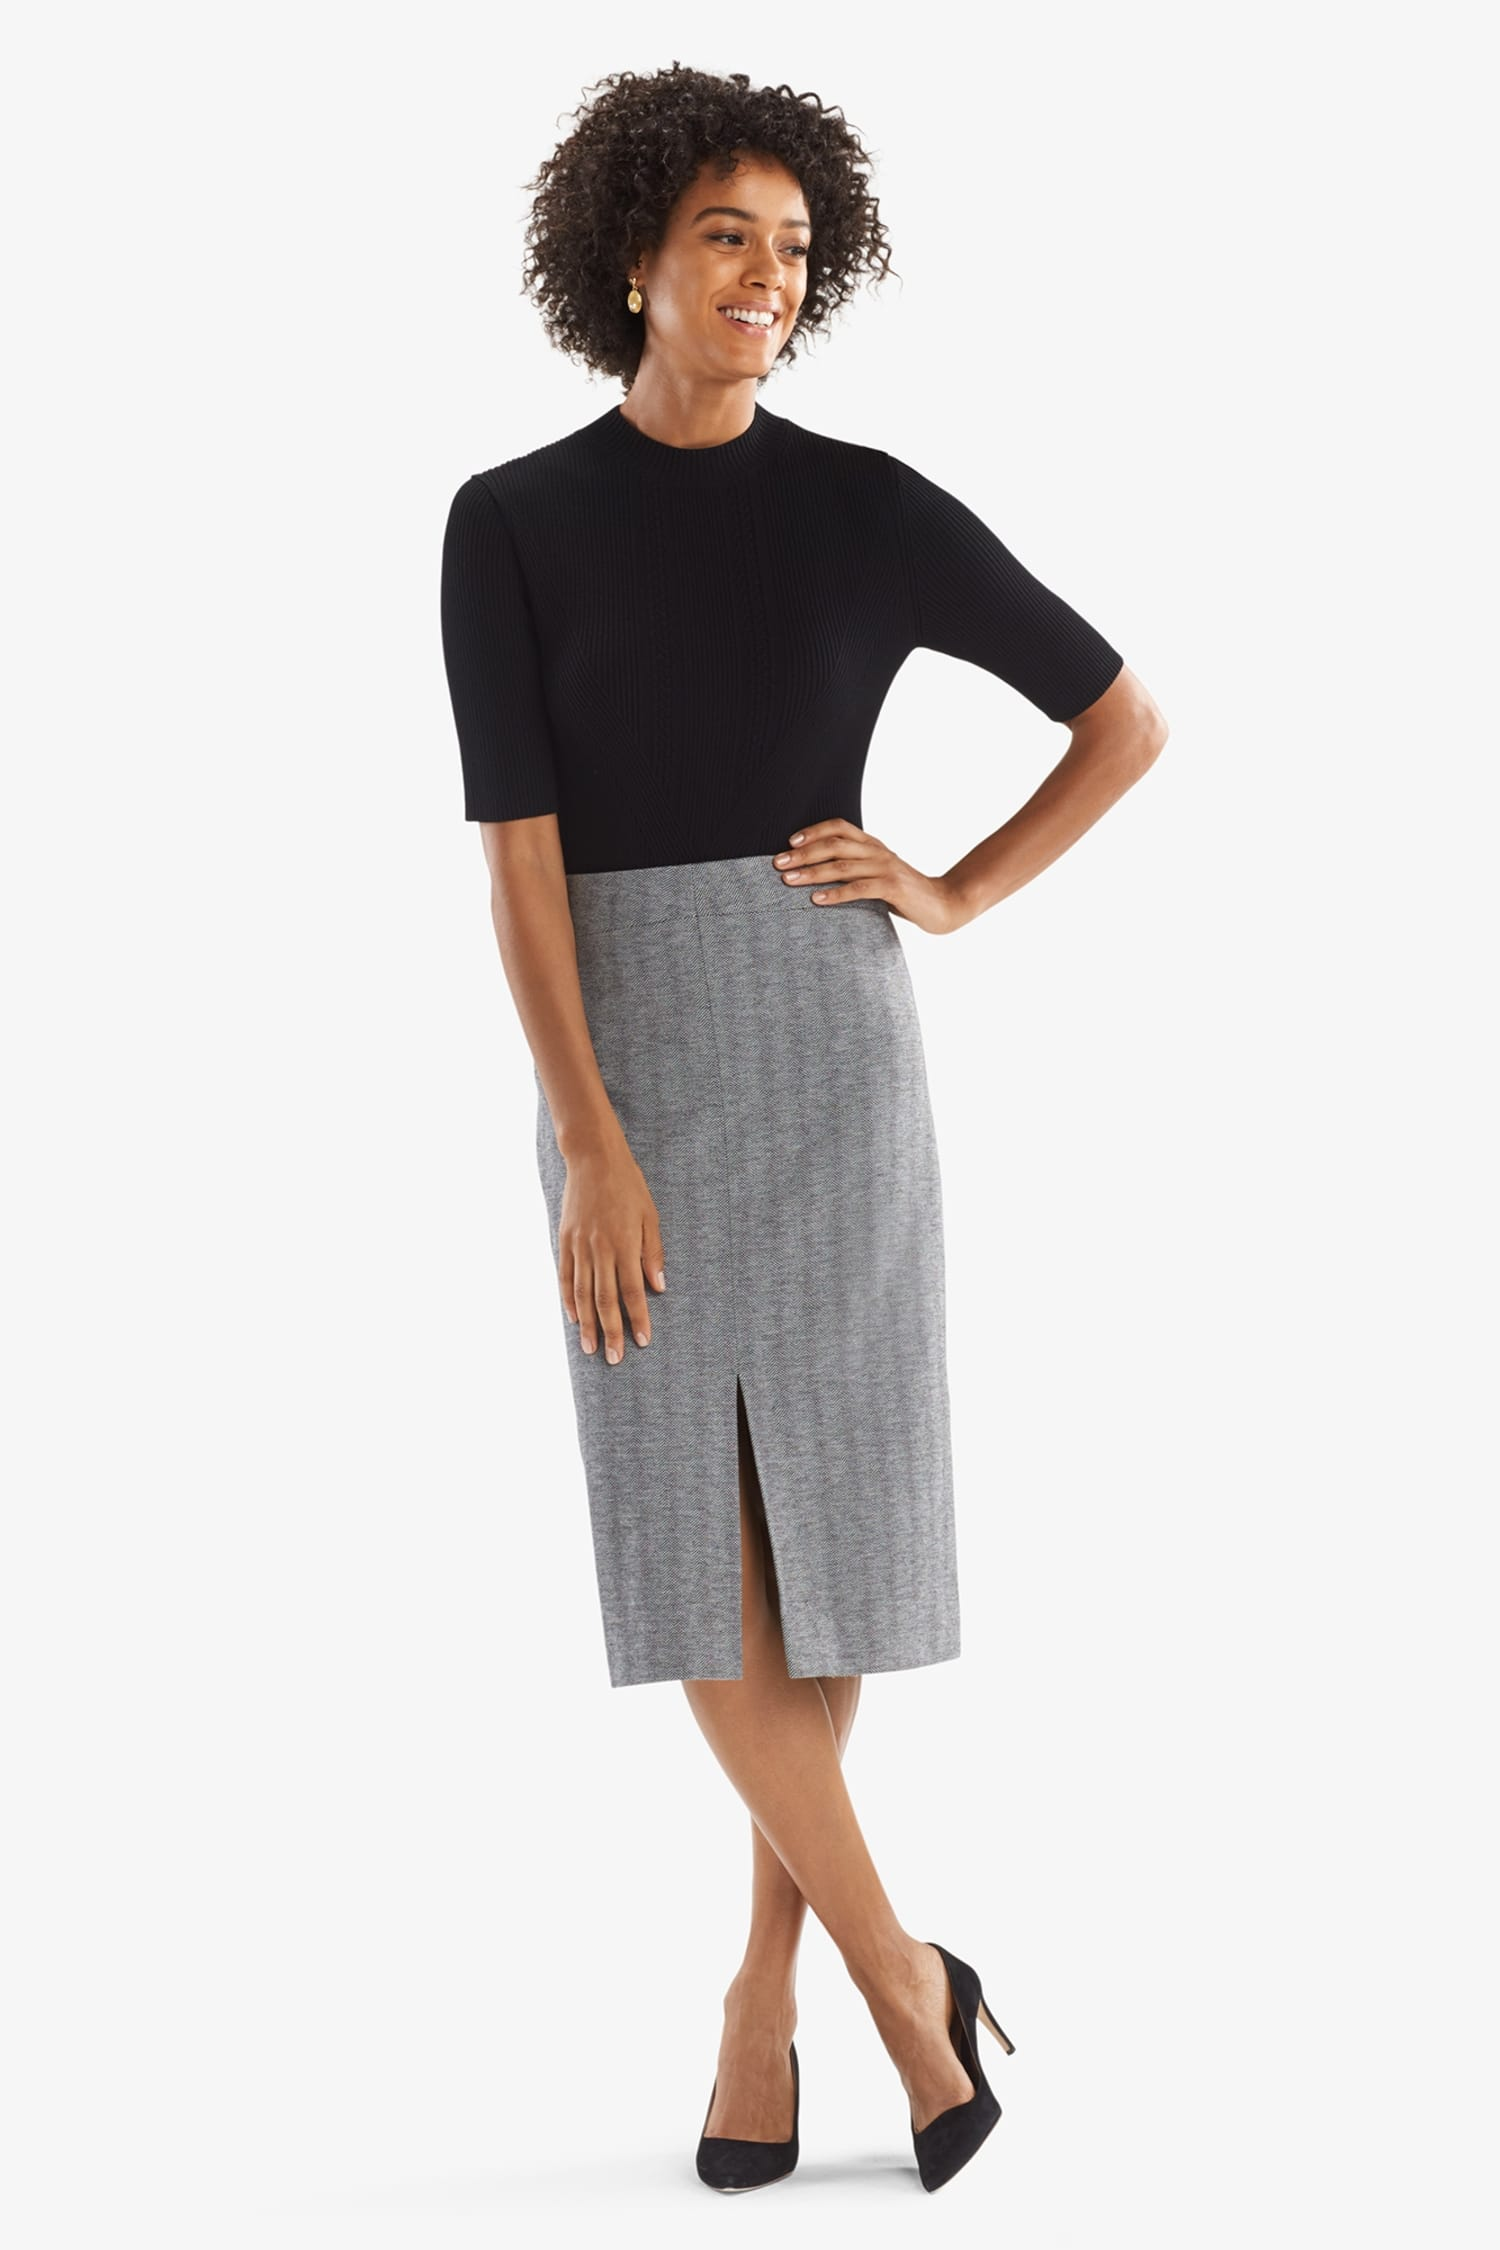 f9877112a49 Morton Skirt—Zip Jacquard - White/Black | MM.LaFleur